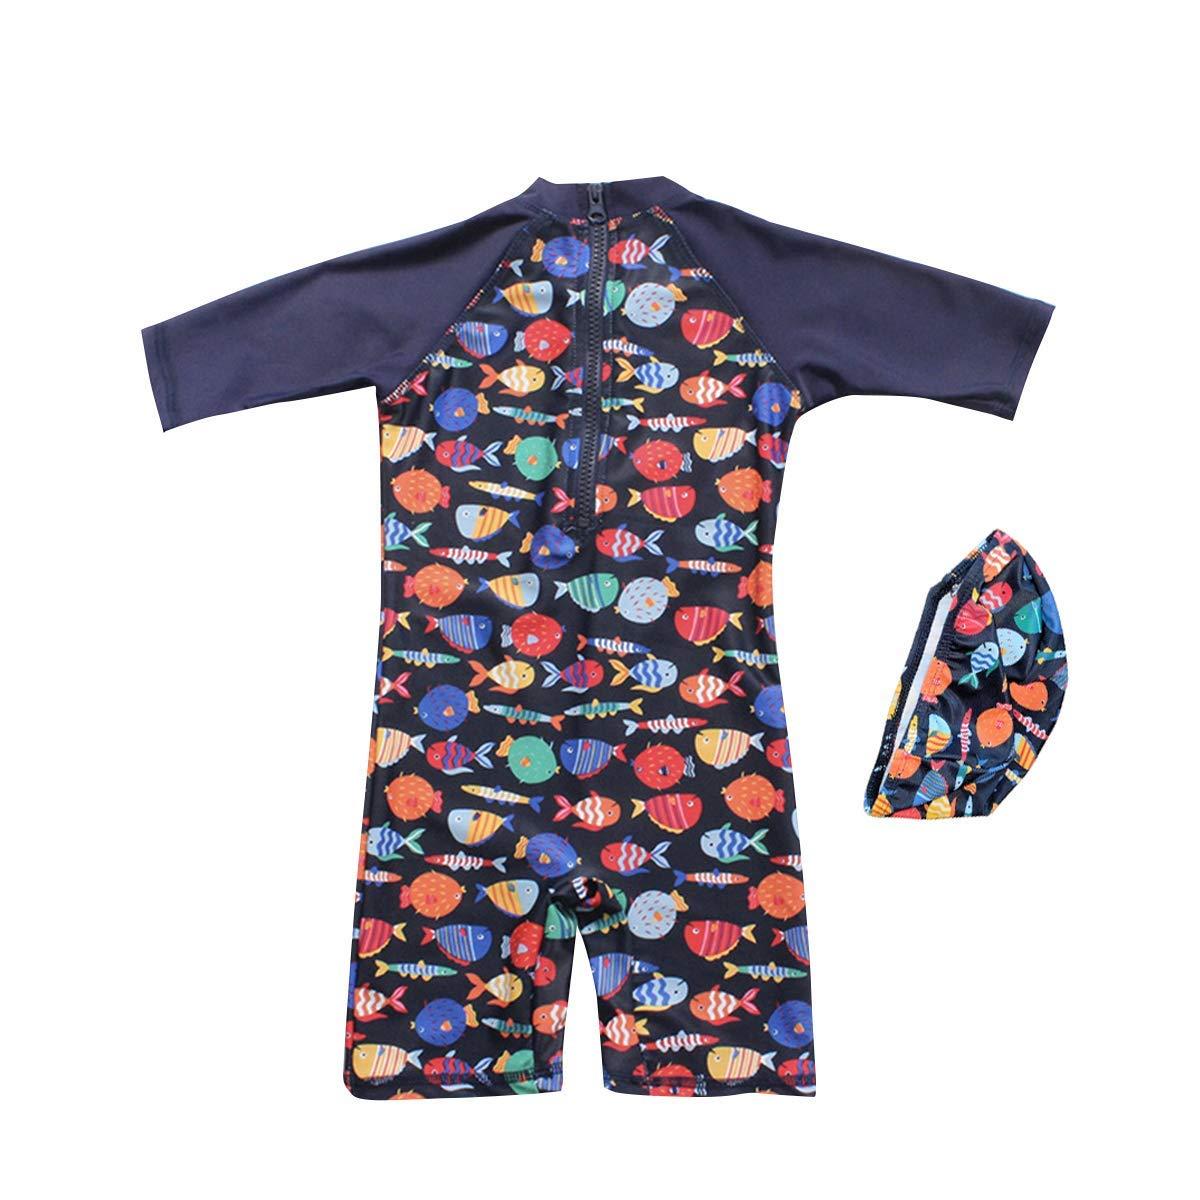 c3c9064f22 Megartico Boys' Swimsuit One Piece Rash Guard Kids Long Sleeve Sunsuit  Swimwear Sets Toddler - Beach Sport Surf